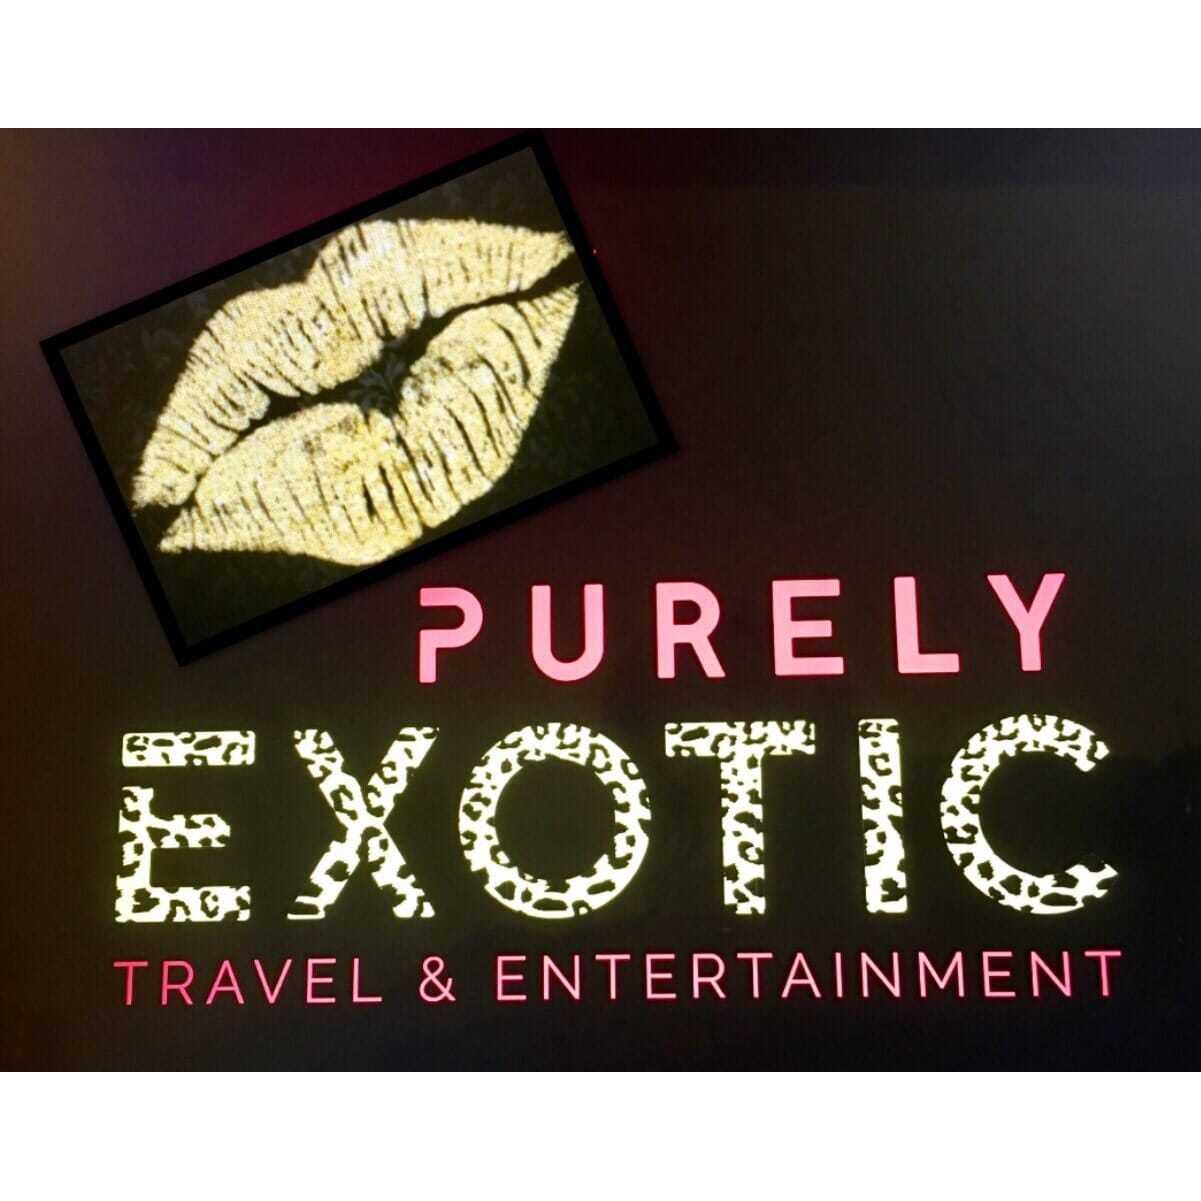 Purely Exotic Travel